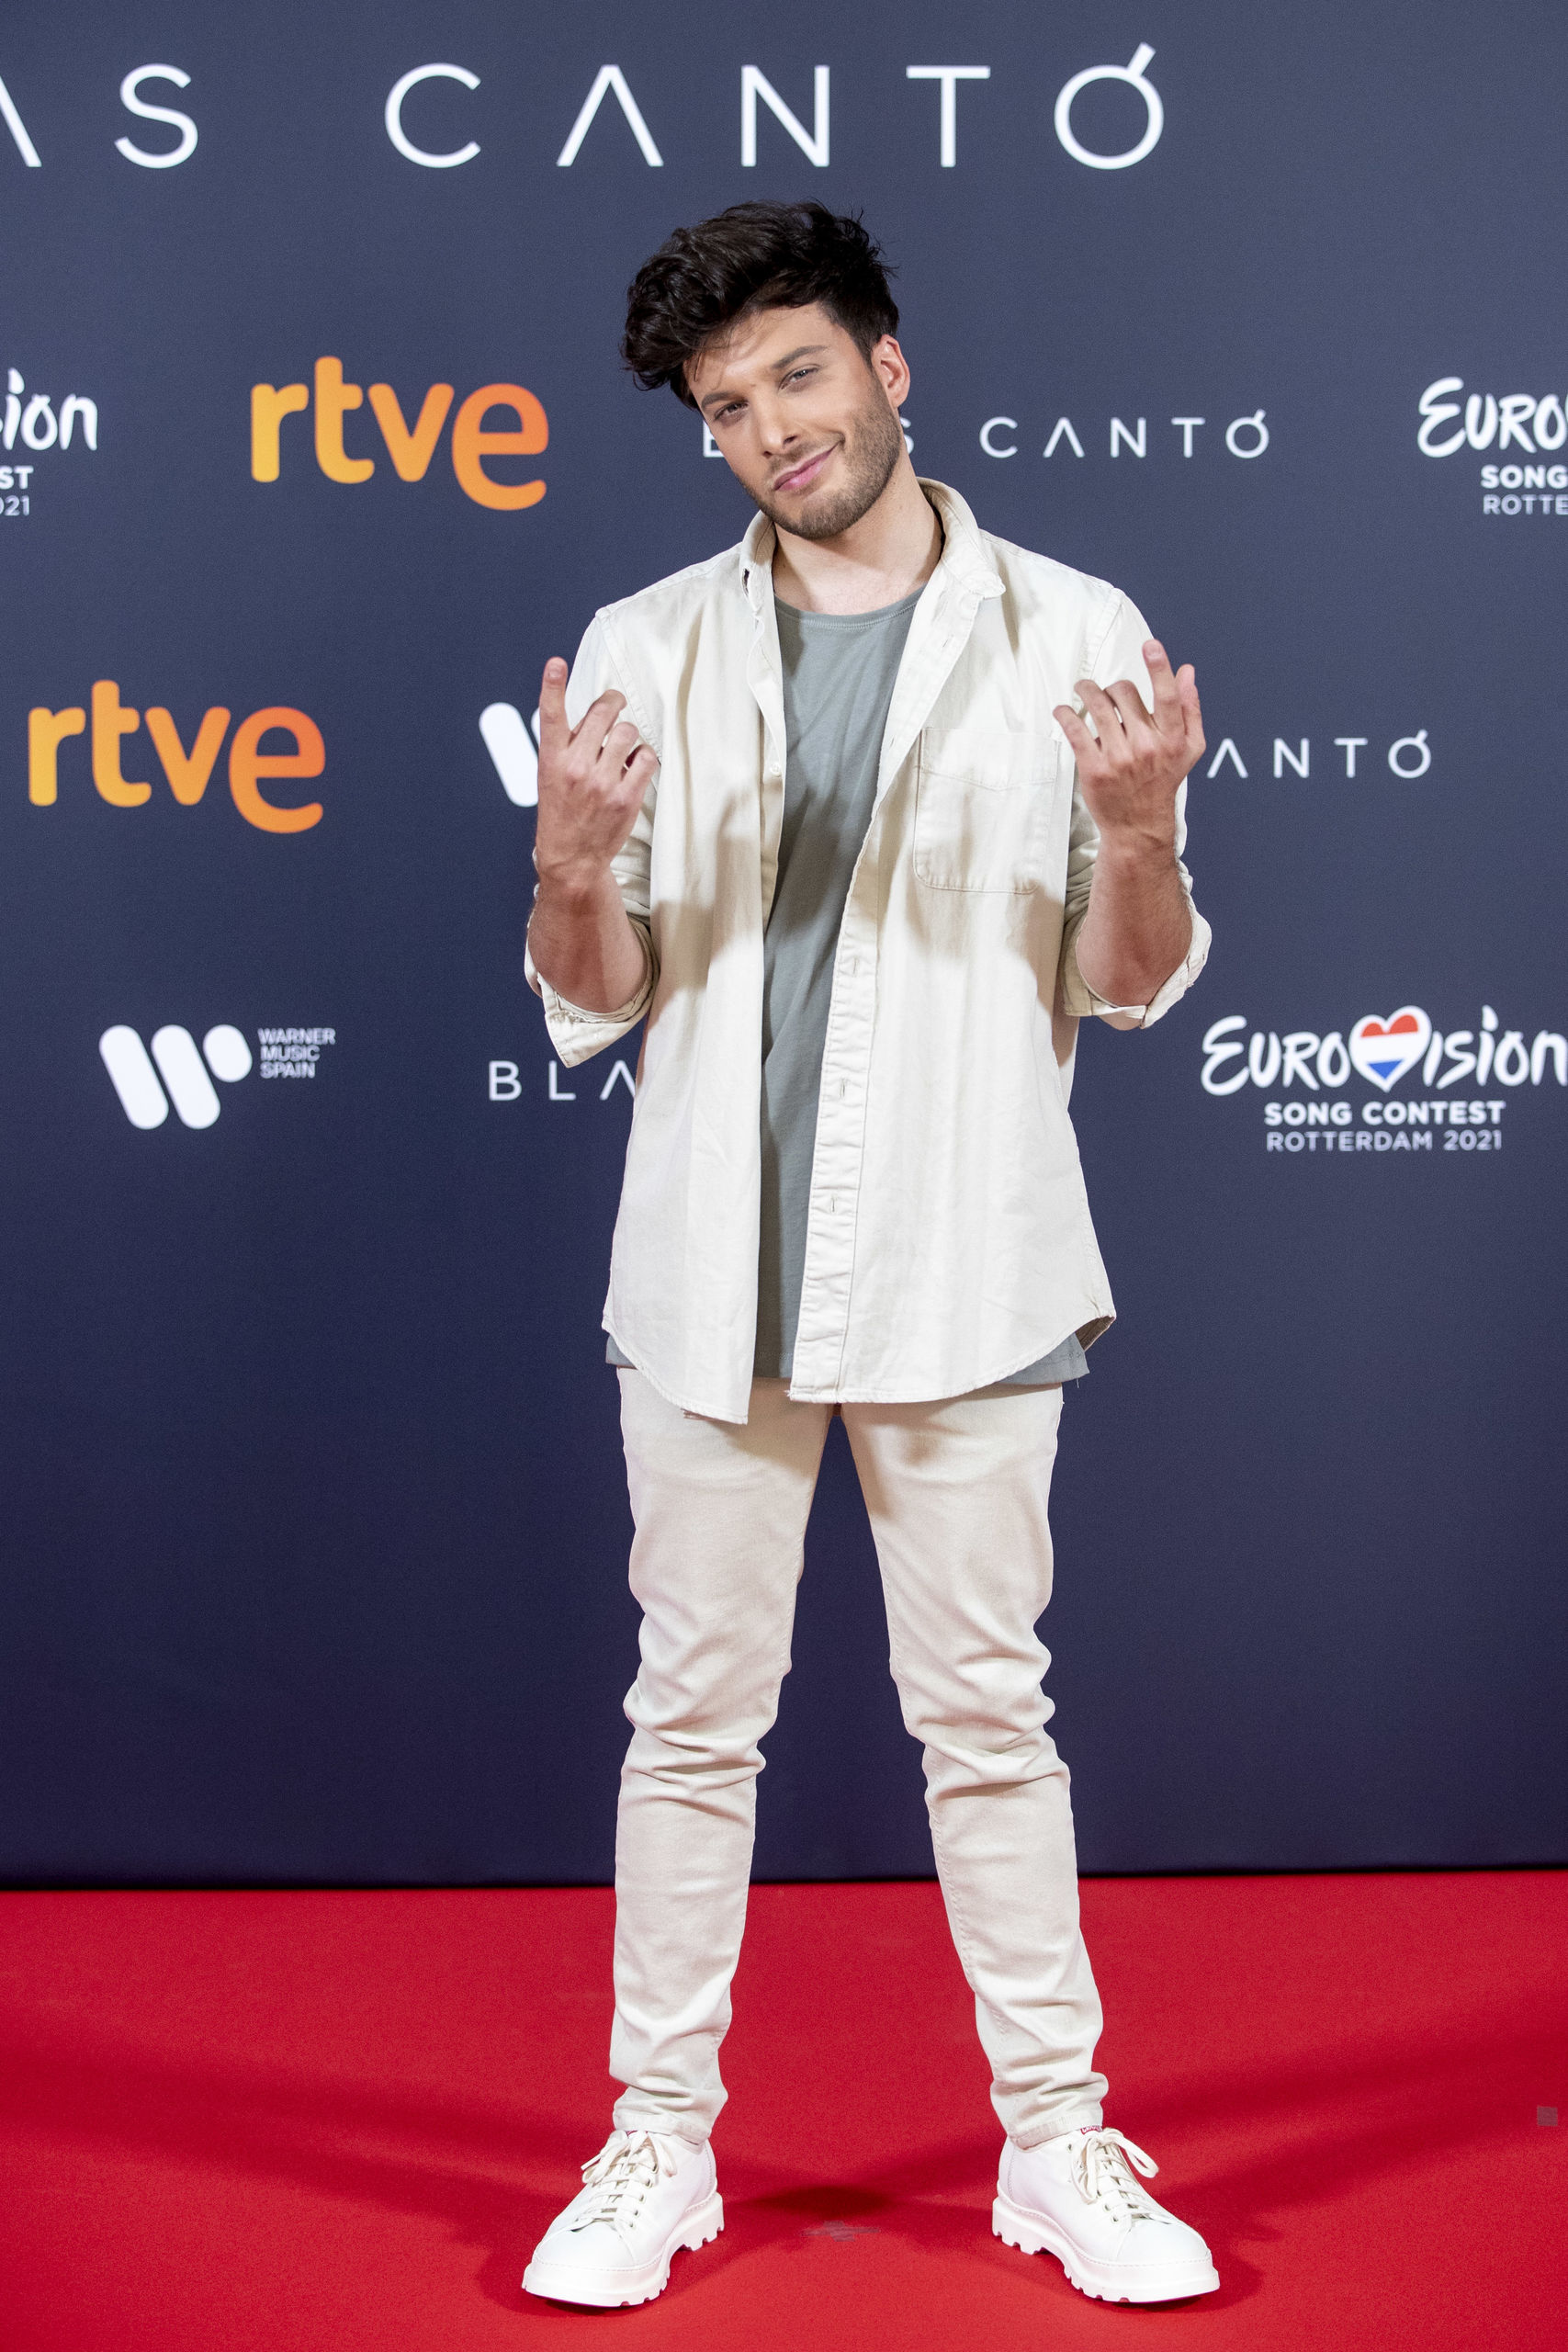 blas-canto-eurovision-2021-1.jpg